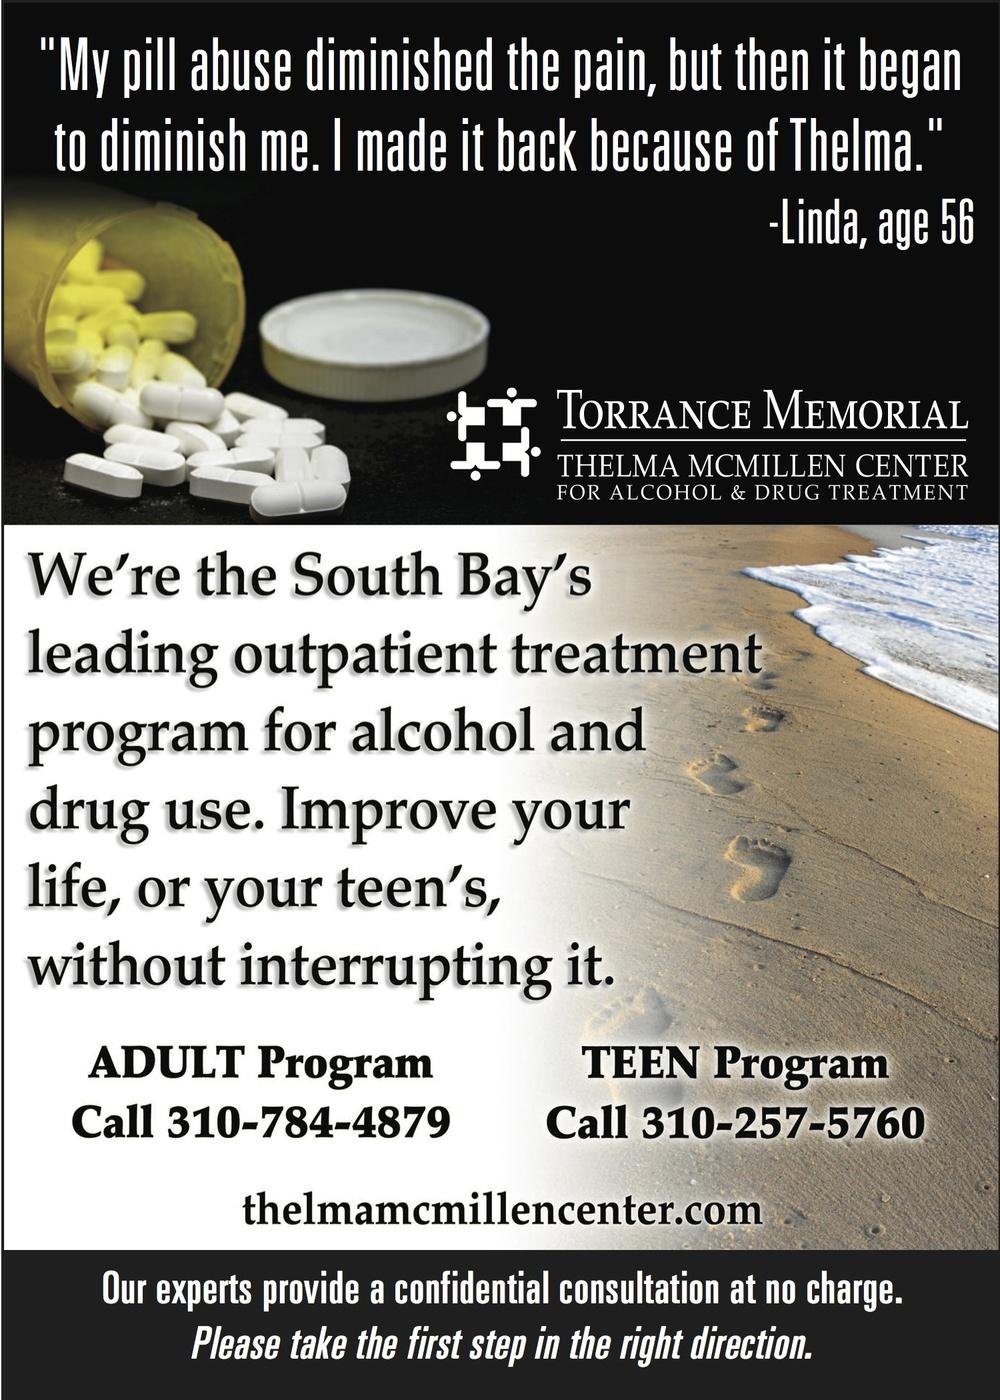 mcmillen-drug-treatment-pills-south-bay